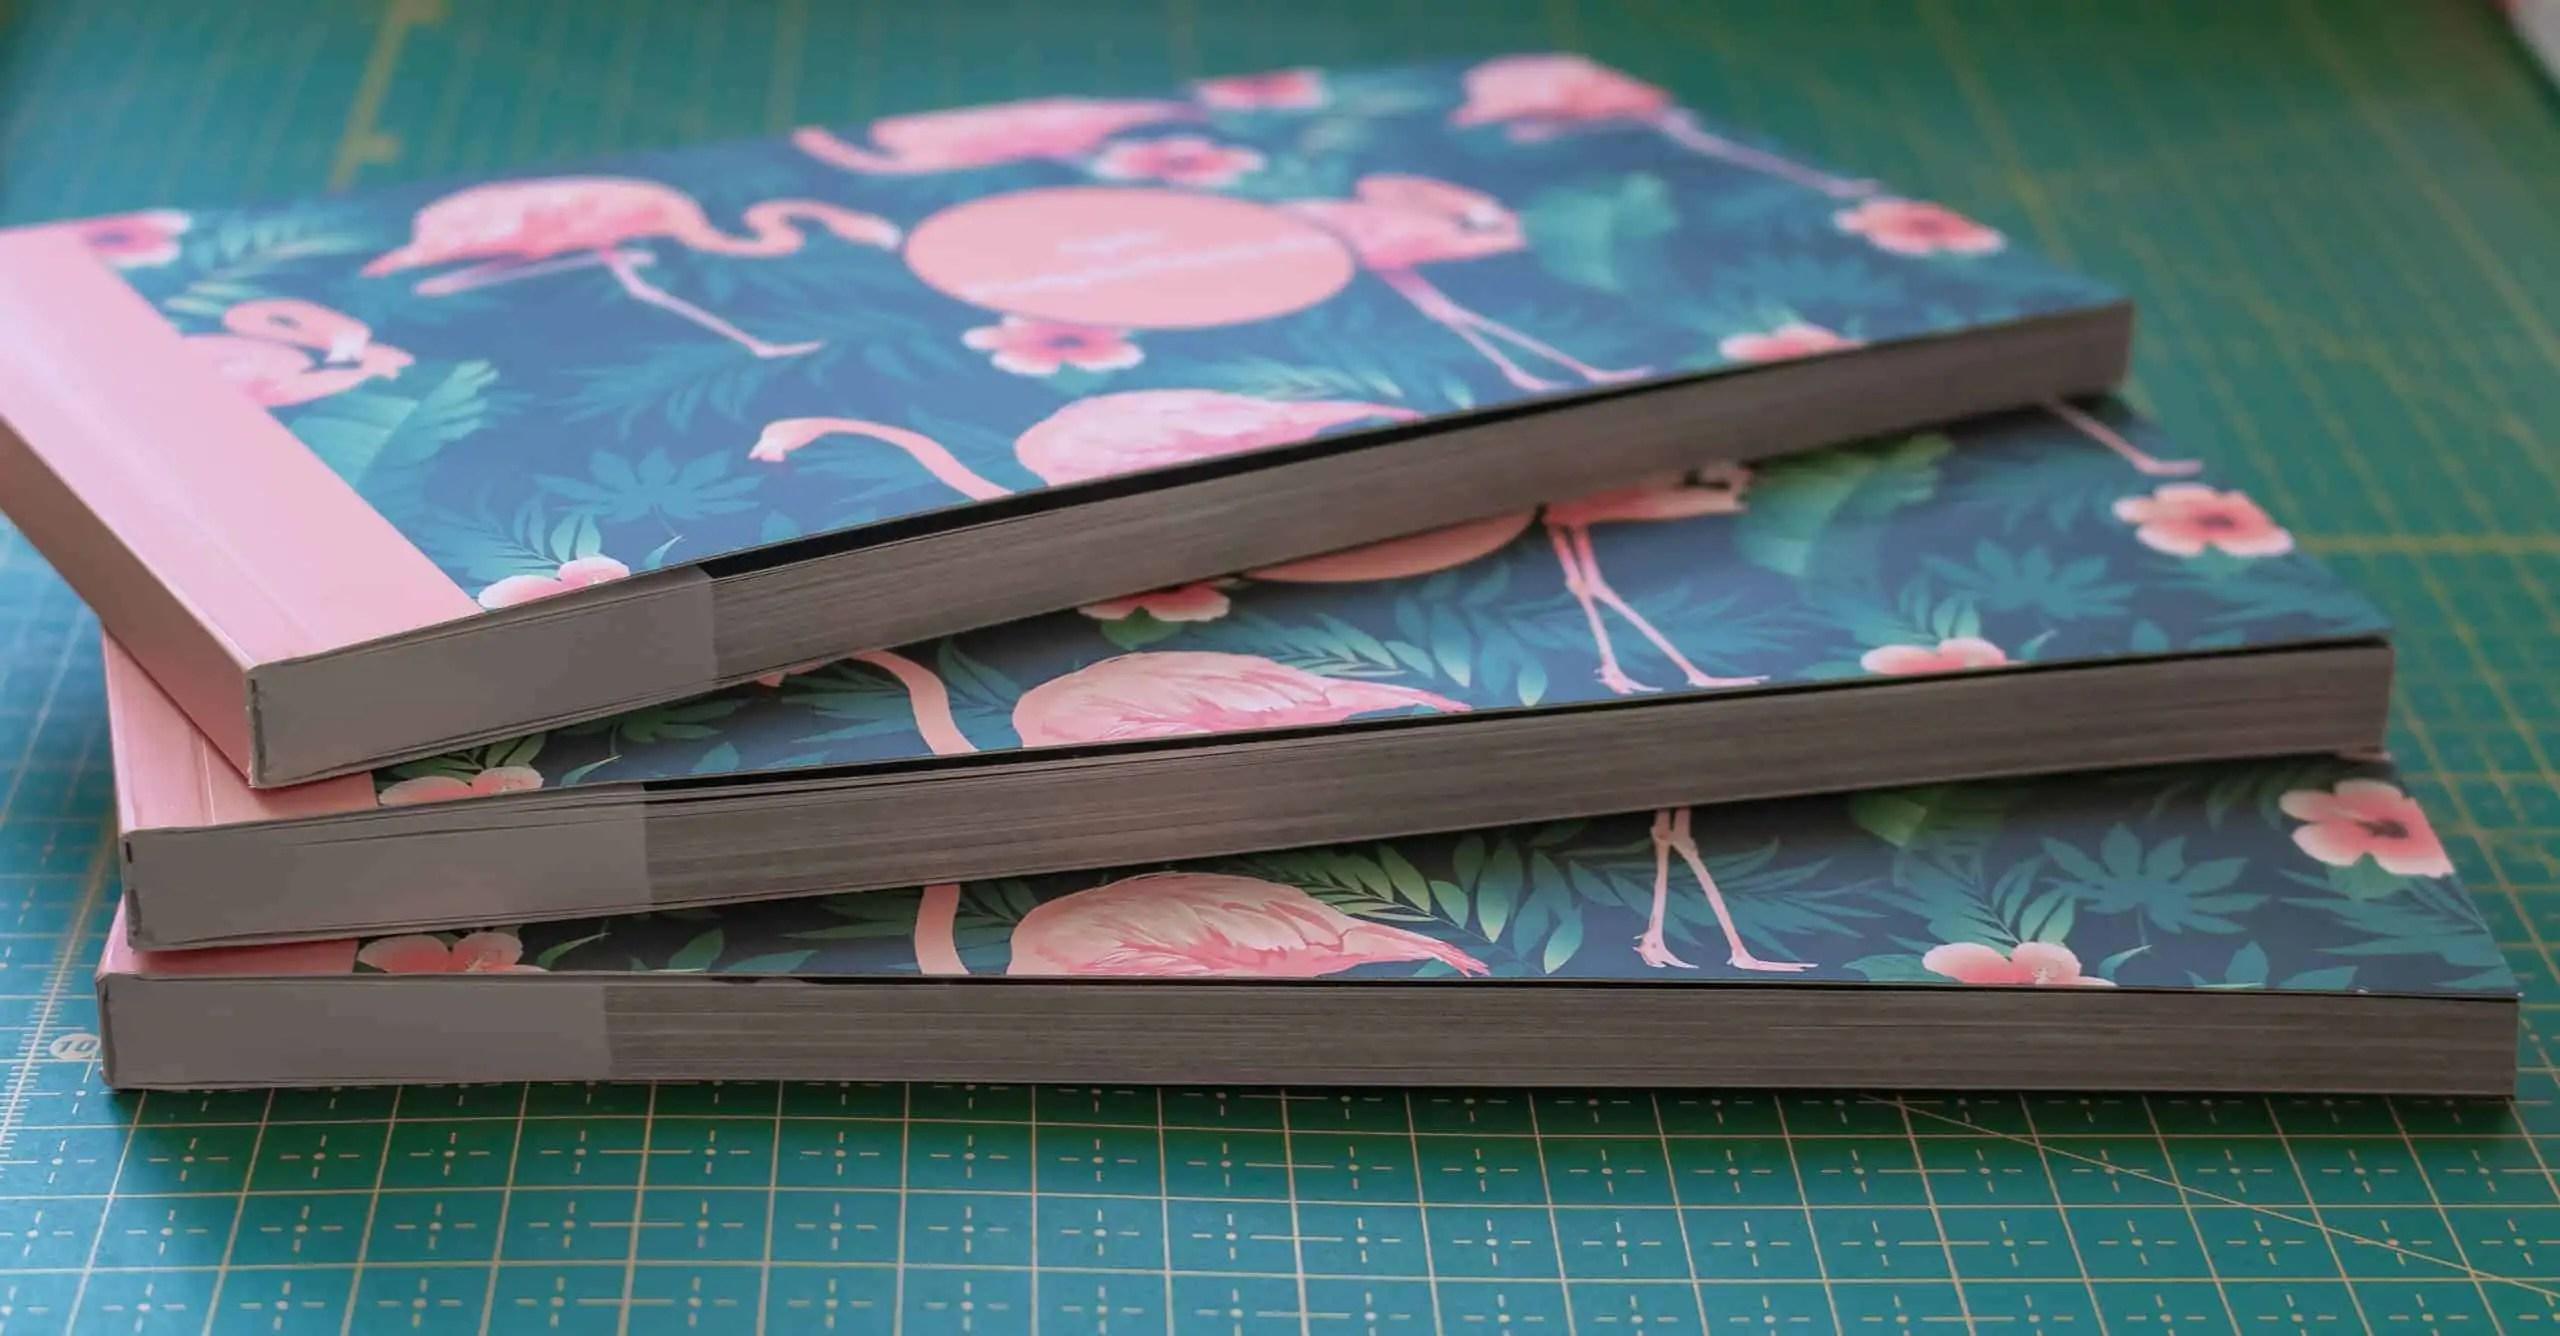 Mini ksiażka fotograficzna Pixbook 2 - Mini książka fotograficzna  Pixbook. Czy warto ?